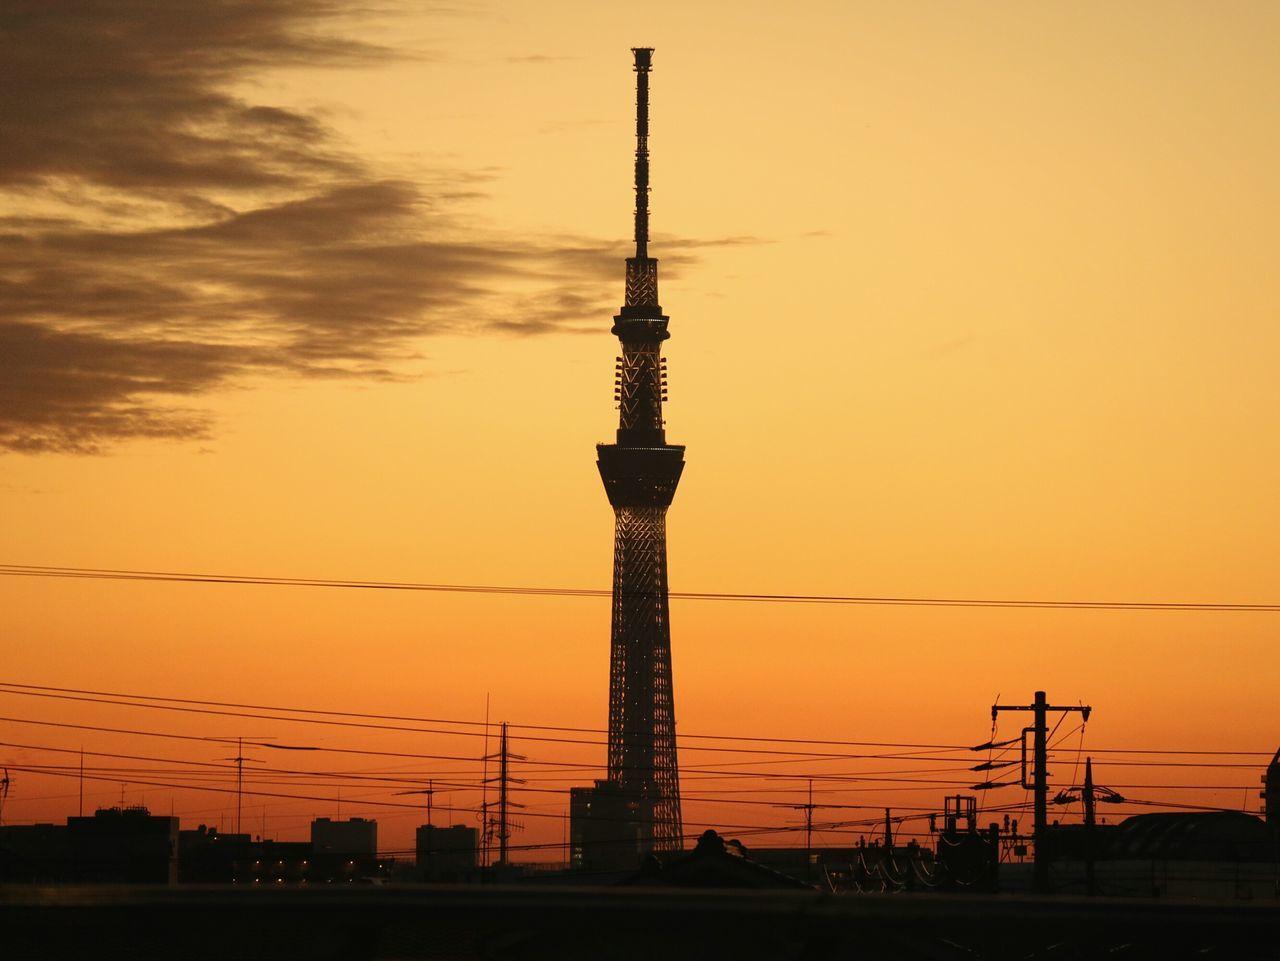 Sunset Tower Orange Color Dramatic Sky Urbanlandscape Tokyo Japan Sunset_collection Landscape Silhouette Skytree Tokyoskytree Wires Dusk